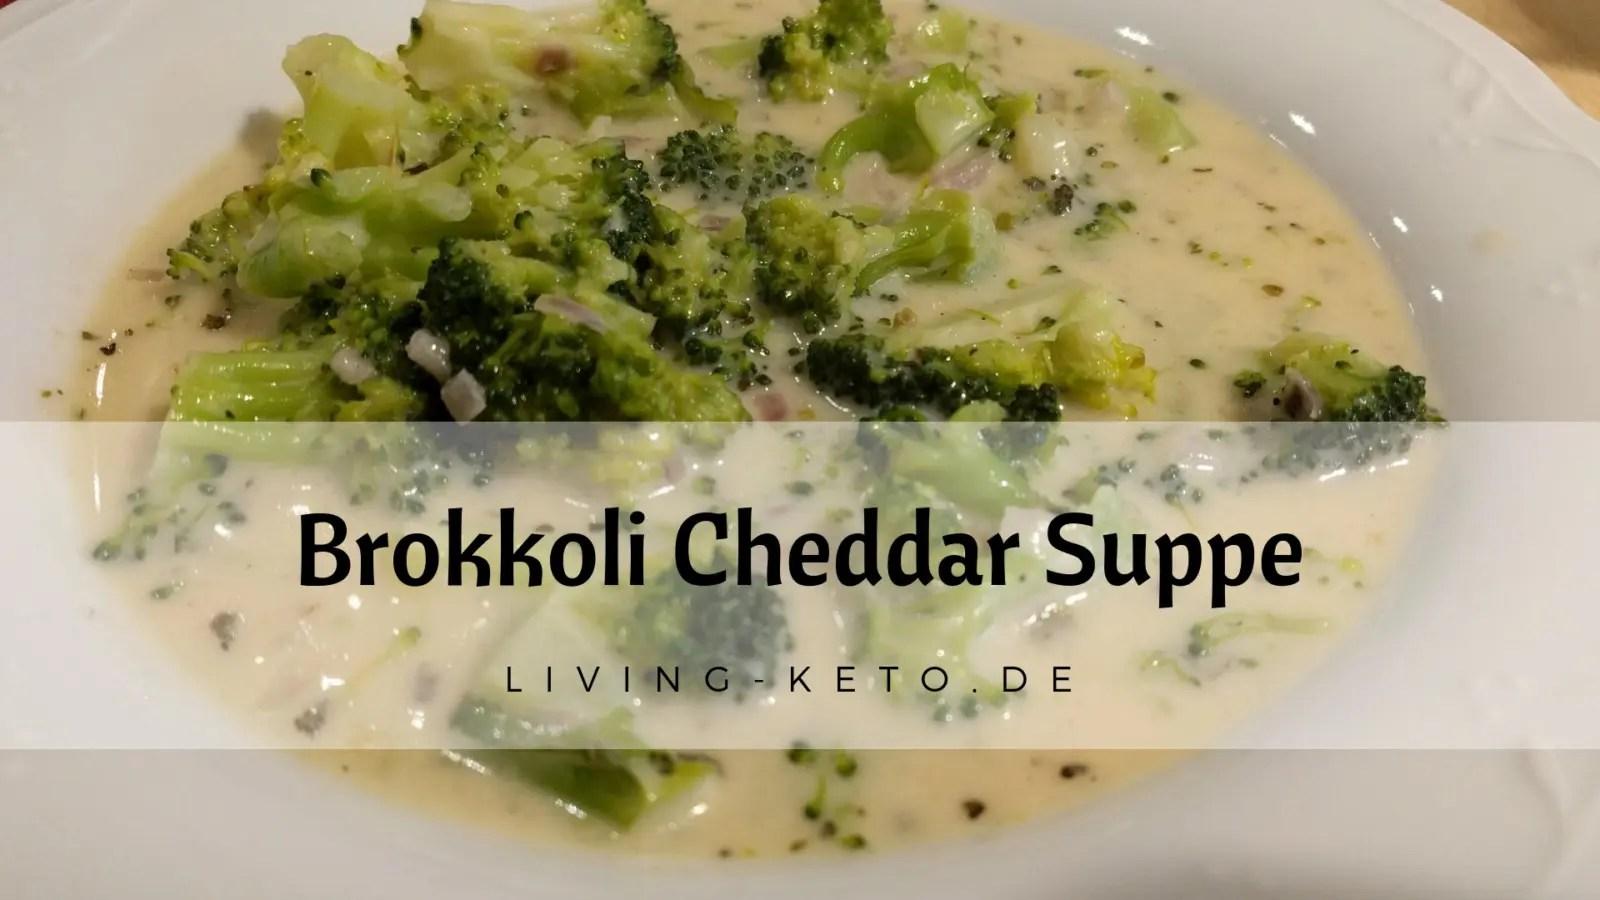 Brokkoli-Cheddar-Suppe